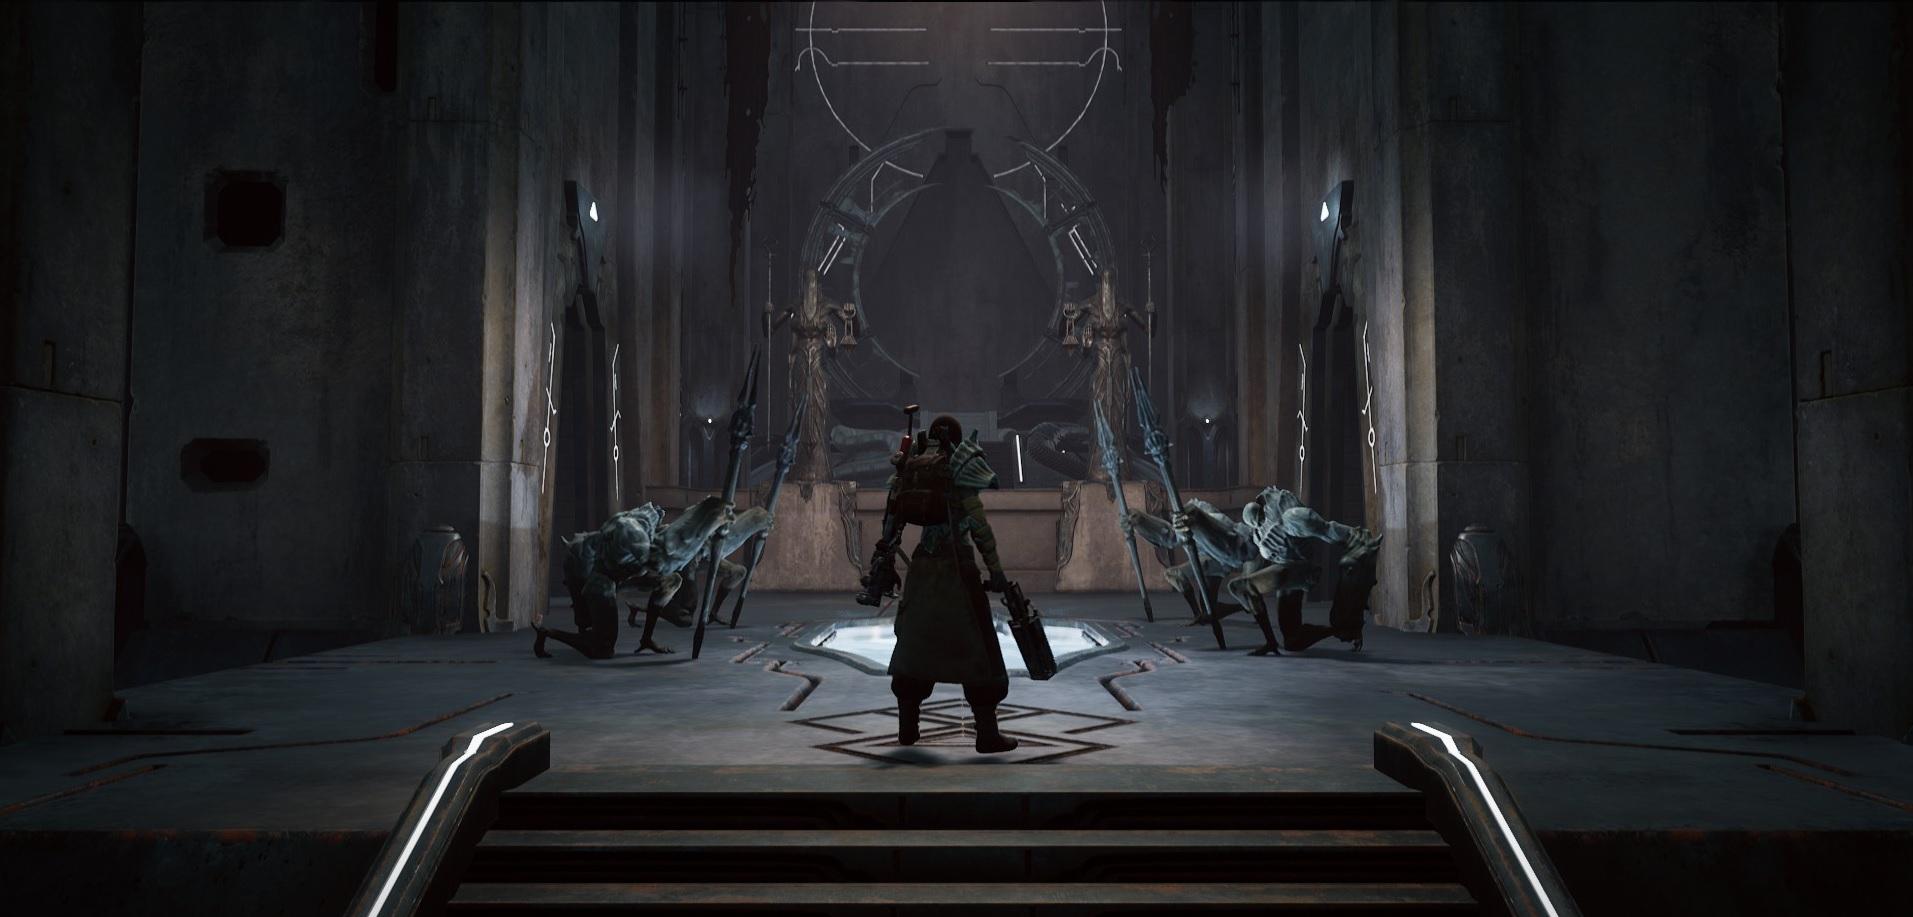 Обзор Remnant: From the Ashes. Кооперативный Dark Souls 4